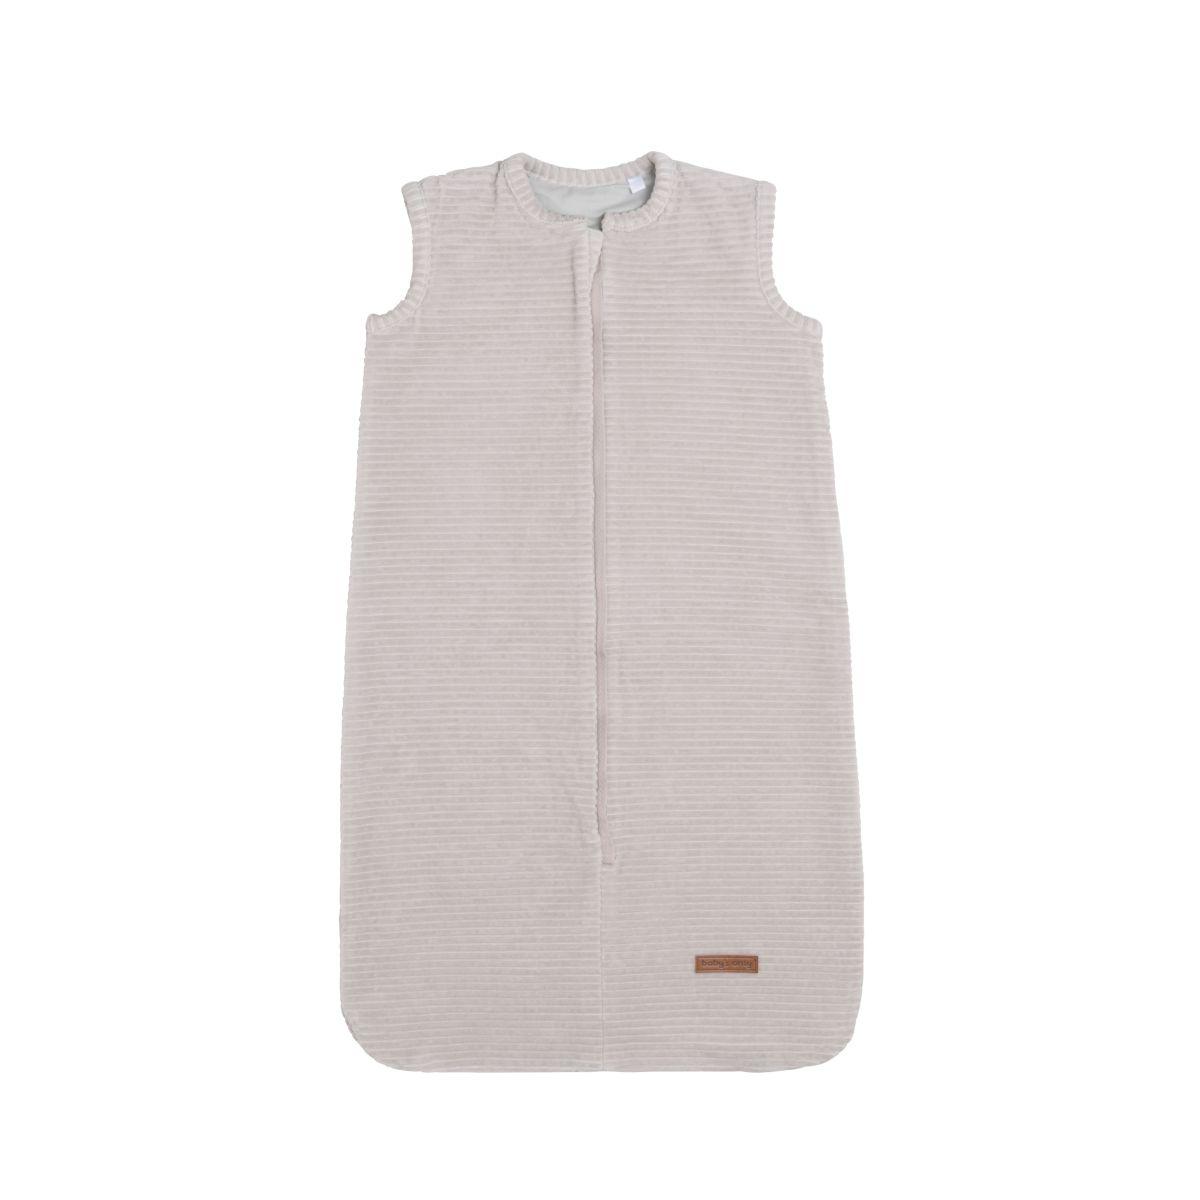 sleeping bag sense pebble grey 70 cm